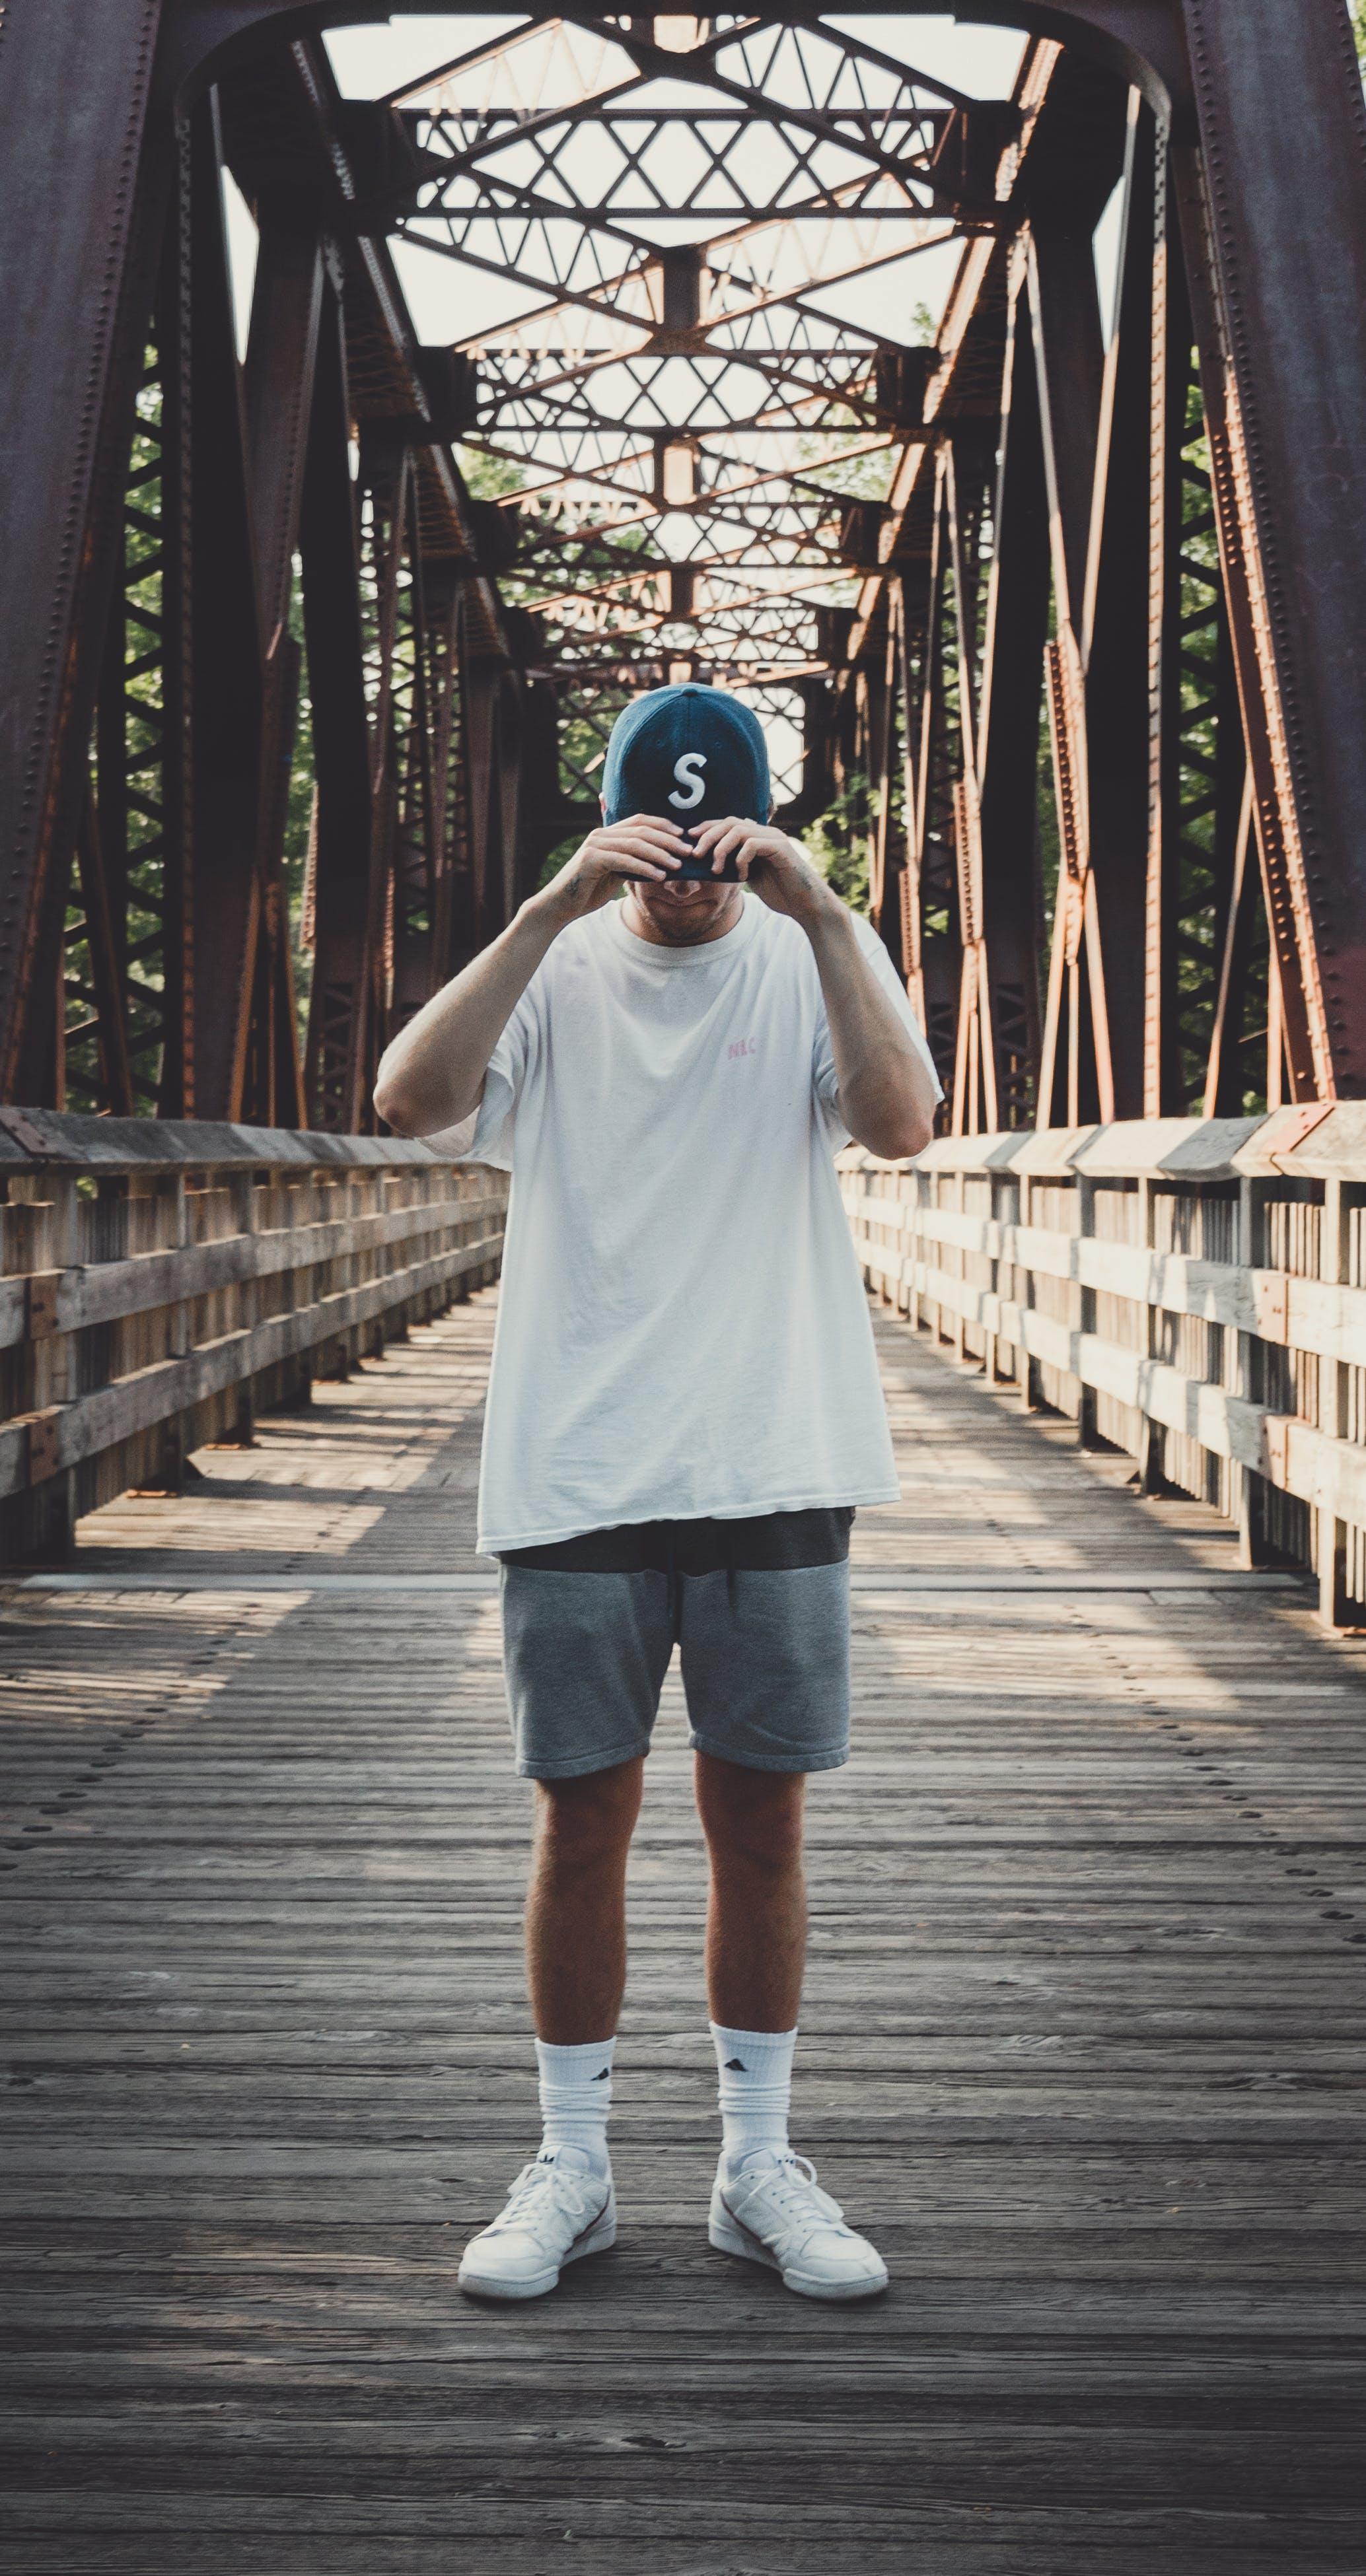 Man in White Crew-neck T-shirt Standing on Bridge